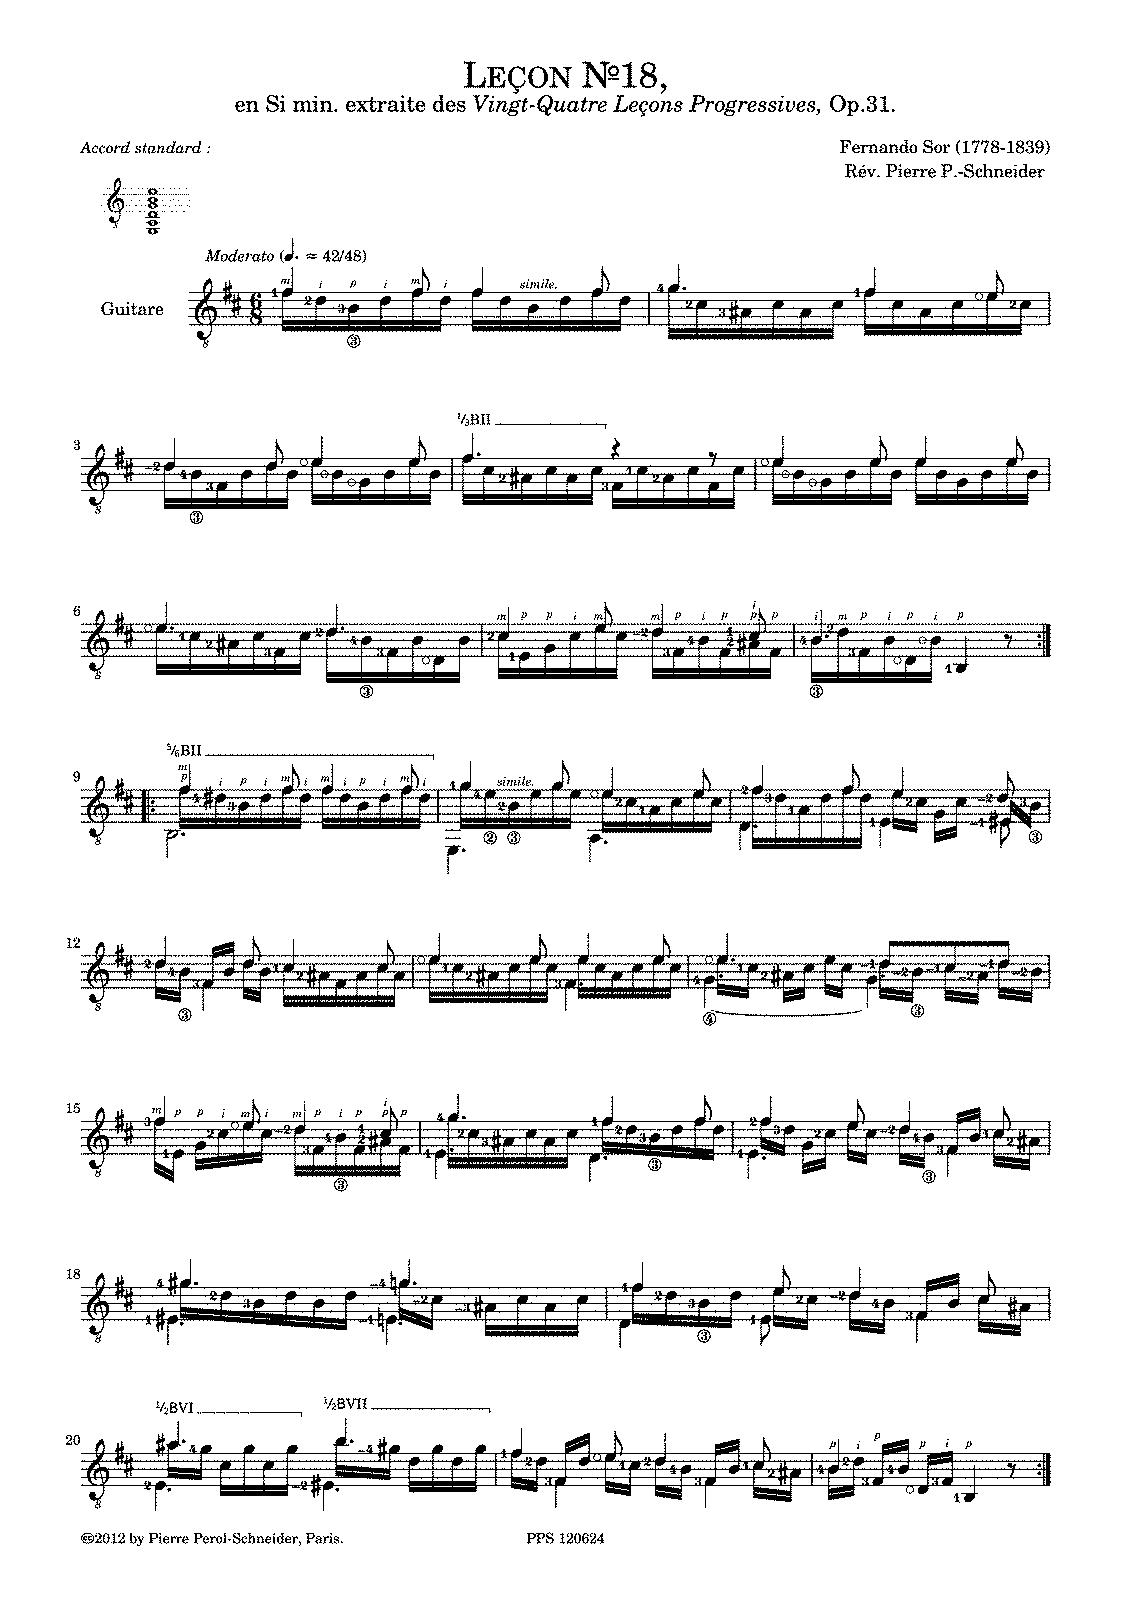 lecons progressives op sor fernando petrucci  moderato in b minor no 18